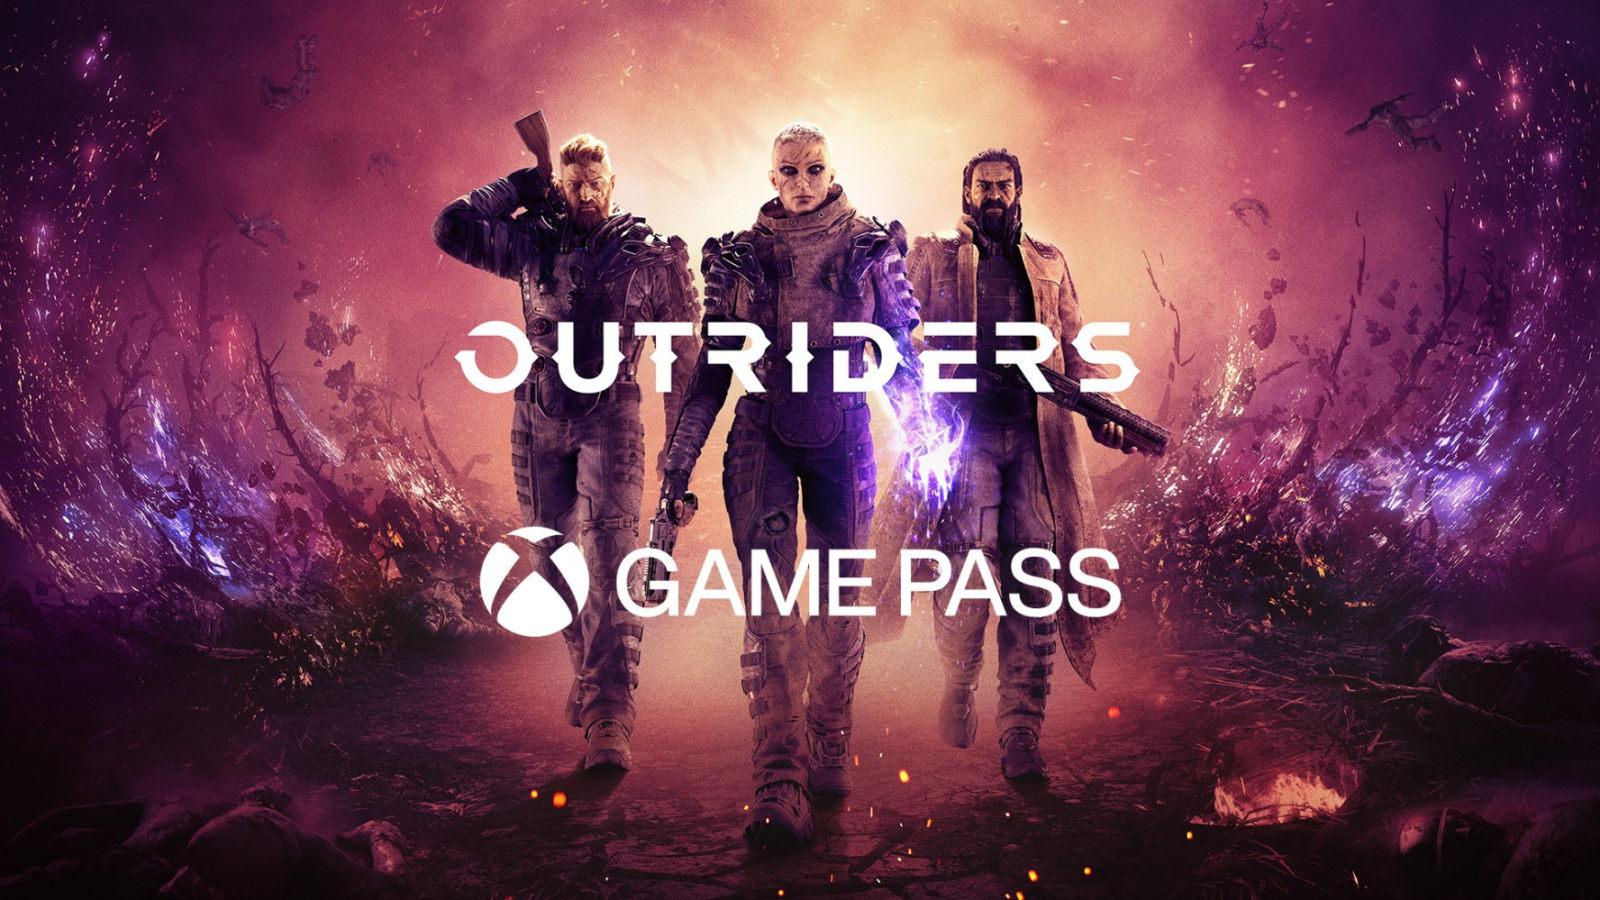 《Outriders》将于发售时,加入Xbox Game Pass